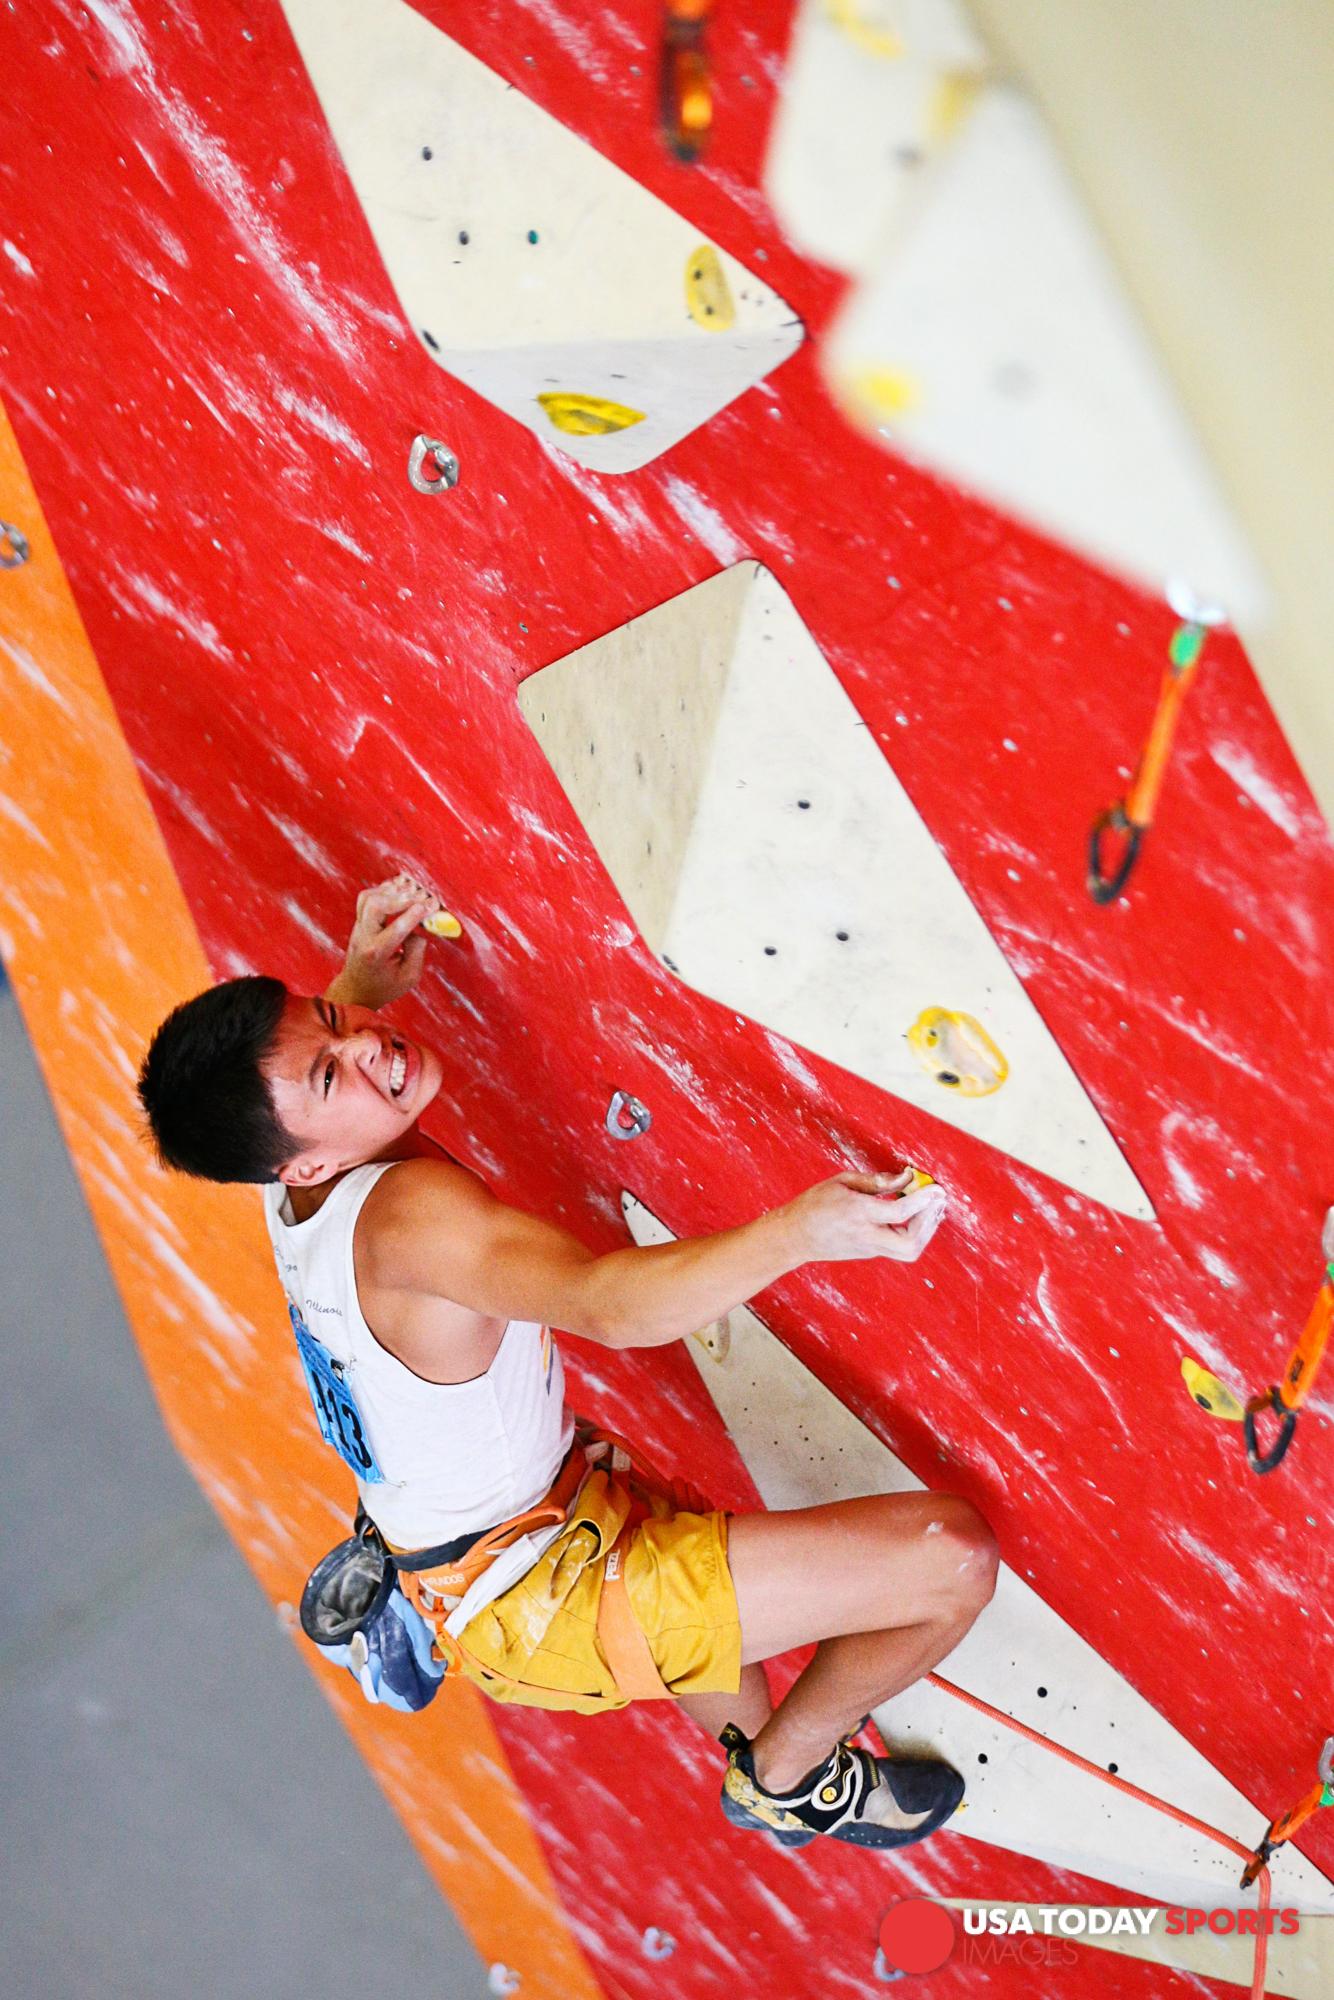 Garrett_Reid_atlanta_advertising_commercial_photographer_sport_and_speed_youth_national_chap_climbing-24.jpg